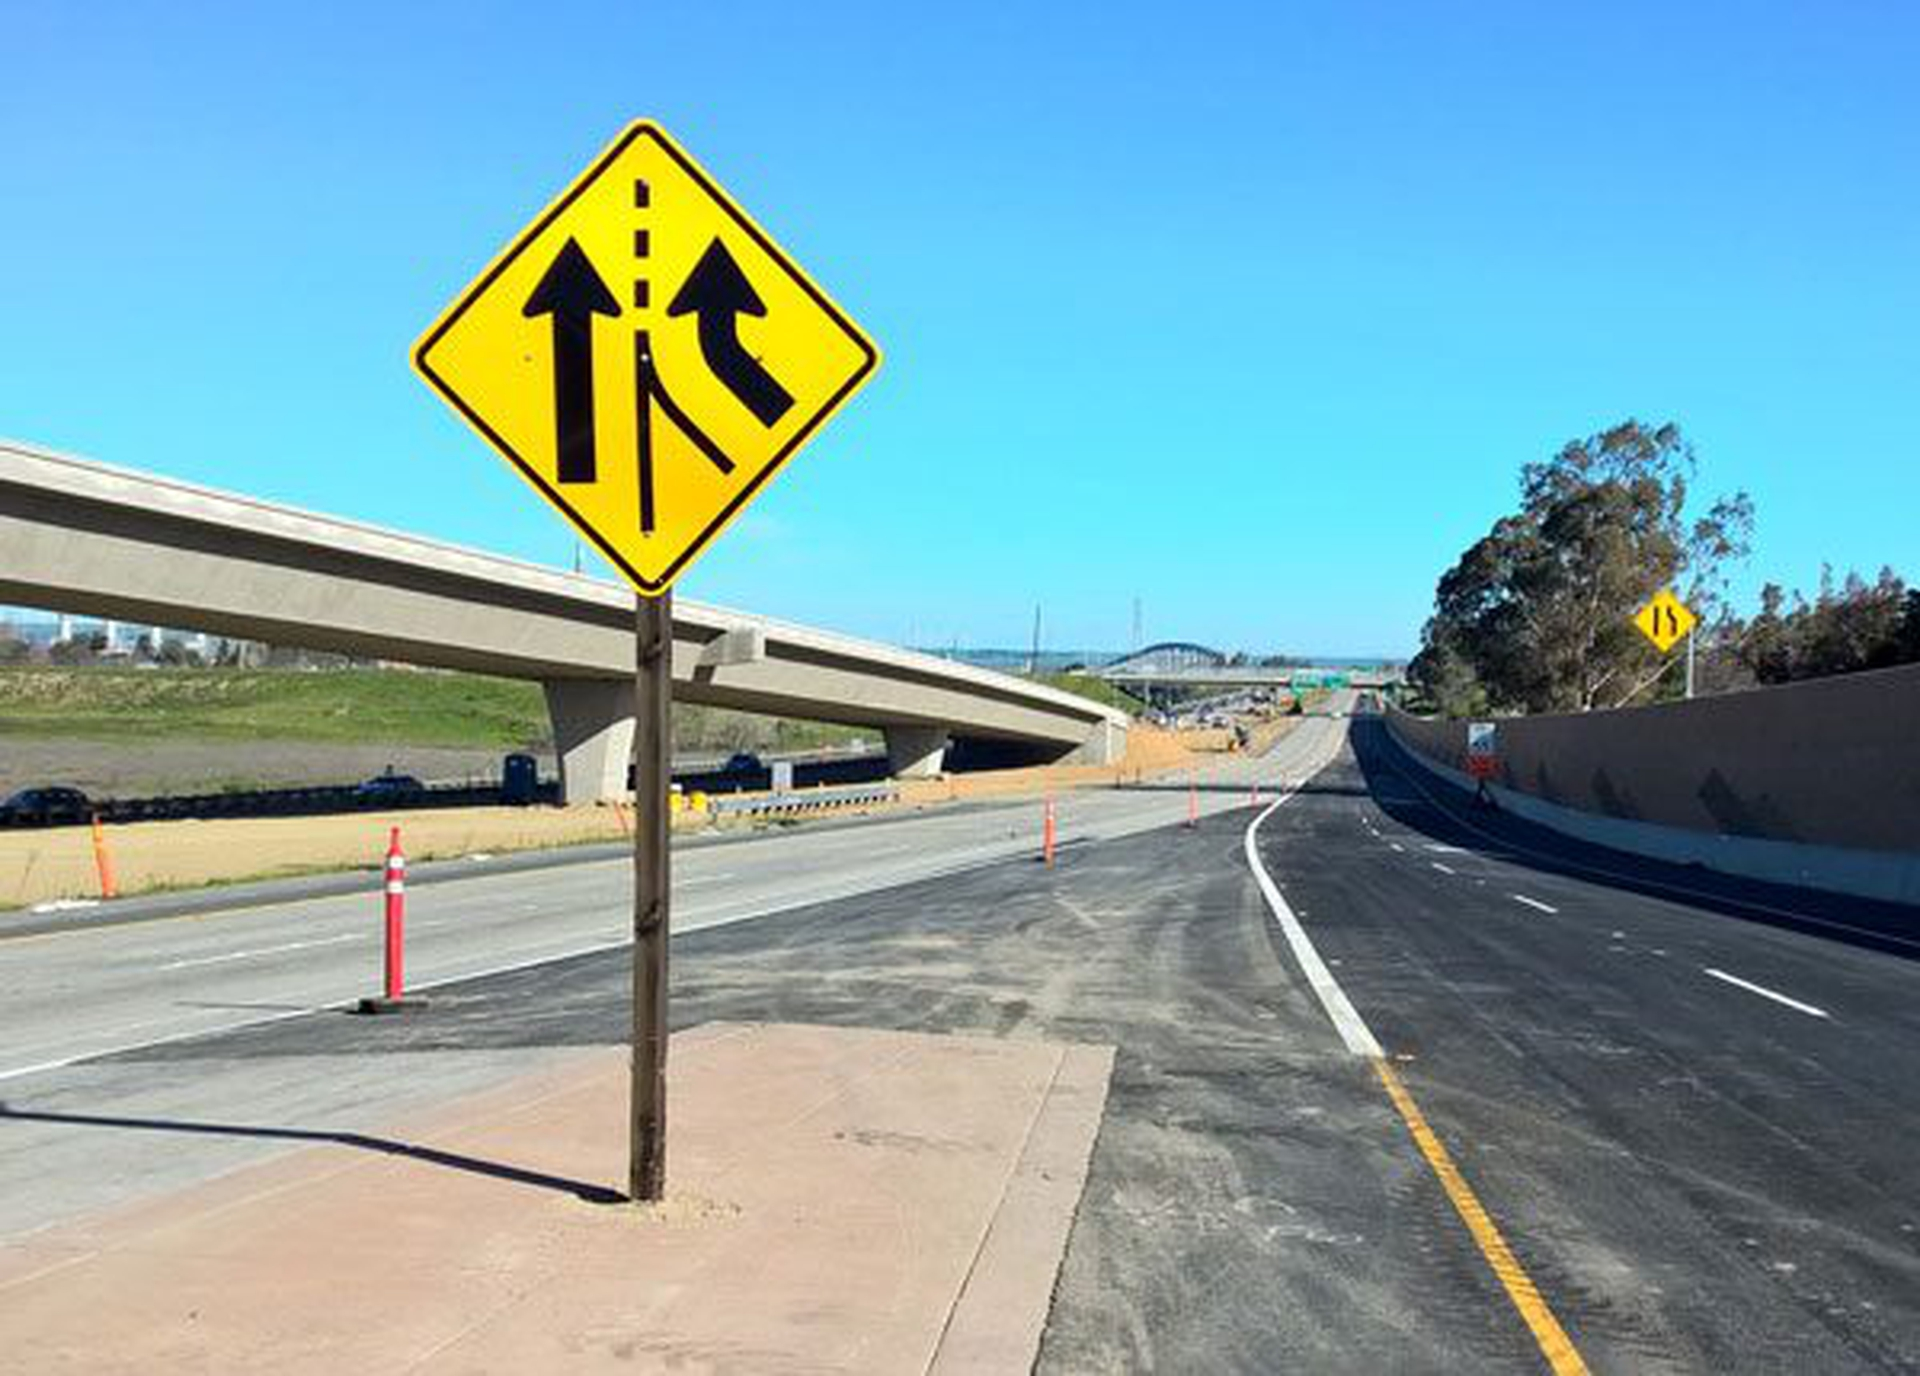 Entering a Highway